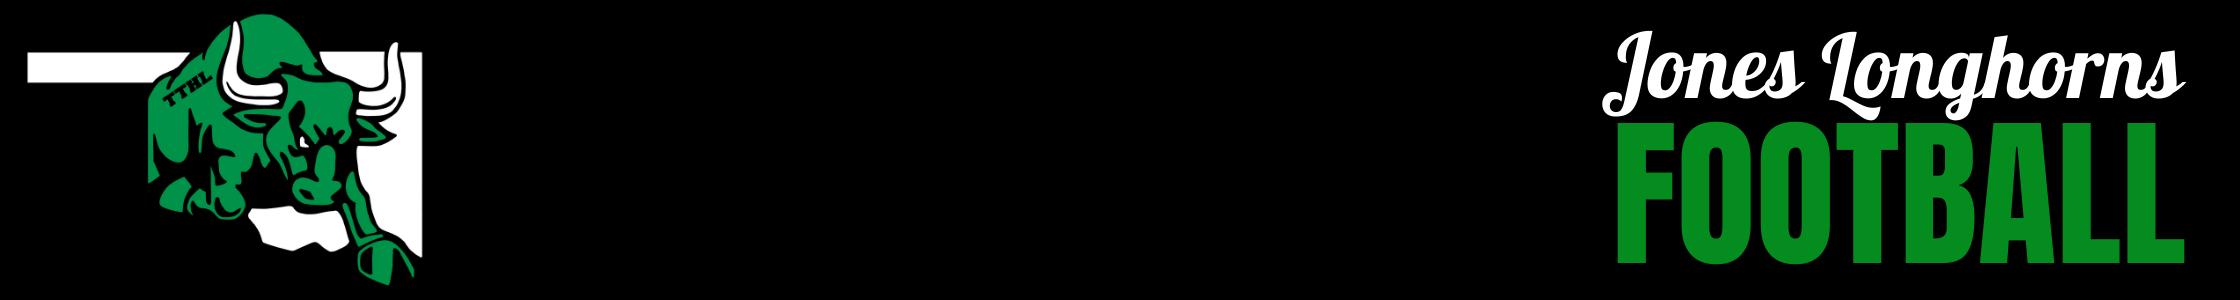 Football Banner